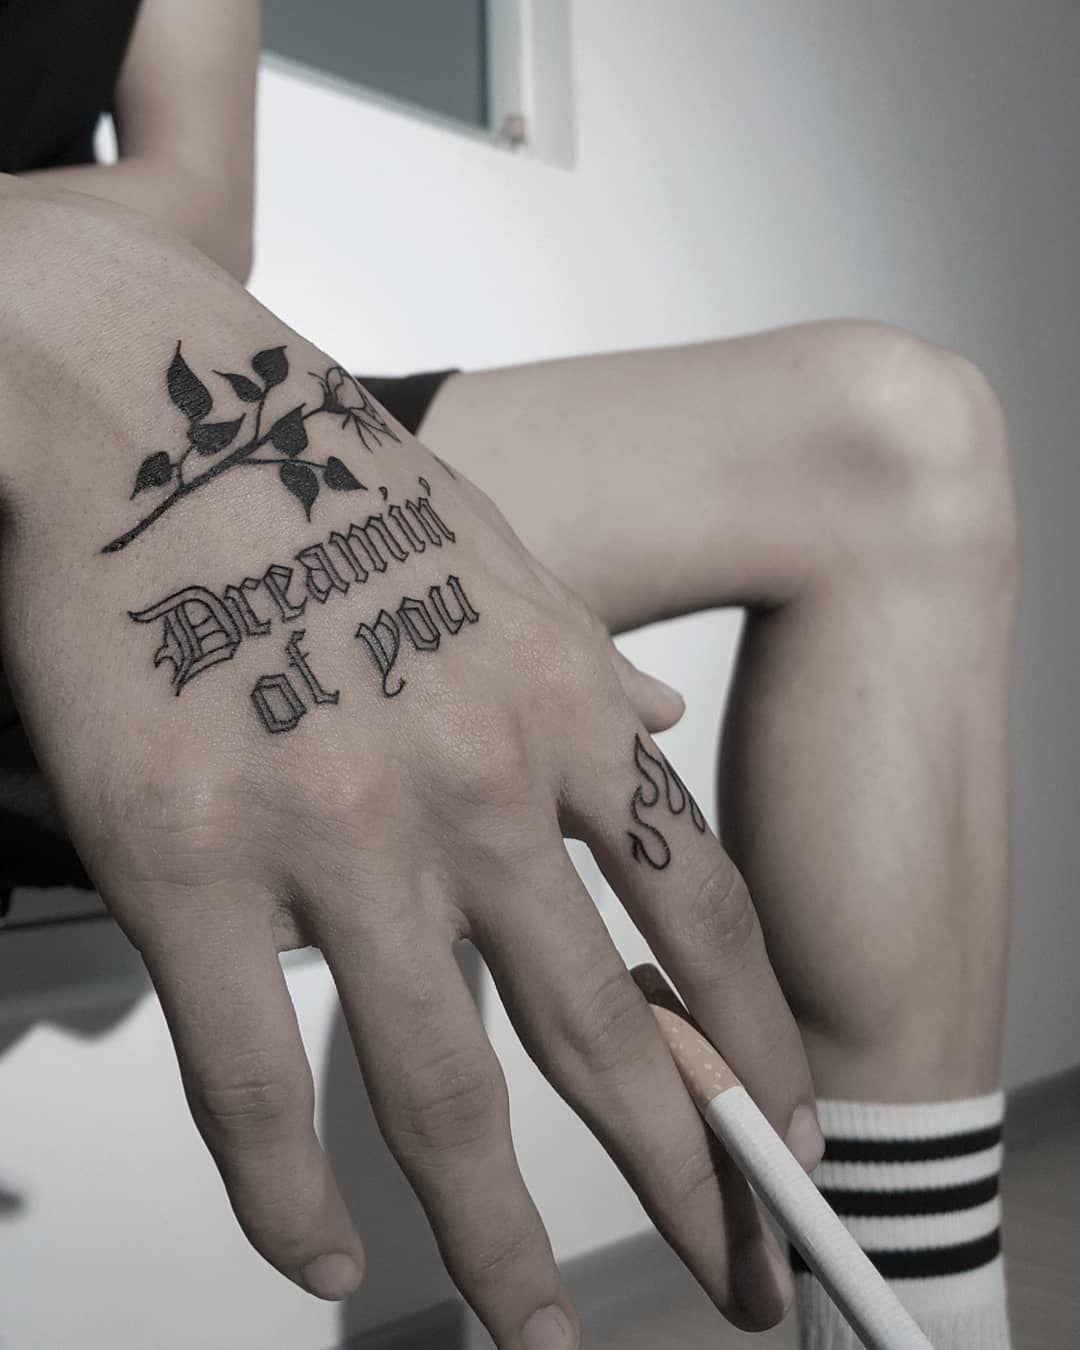 ℍ𝕦𝕘𝕚 𝔸𝕣𝕥𝕚𝕤𝕥𝕚𝕔 op Instagram Dreamin of you hugiart  Esenyurt  Istanbul  türkiye fashion  tattoos on hand ℍ𝕦𝕘𝕚 𝔸𝕣𝕥𝕚𝕤𝕥𝕚𝕔 op Instagram Dreamin of you hugiart  Esenyurt...